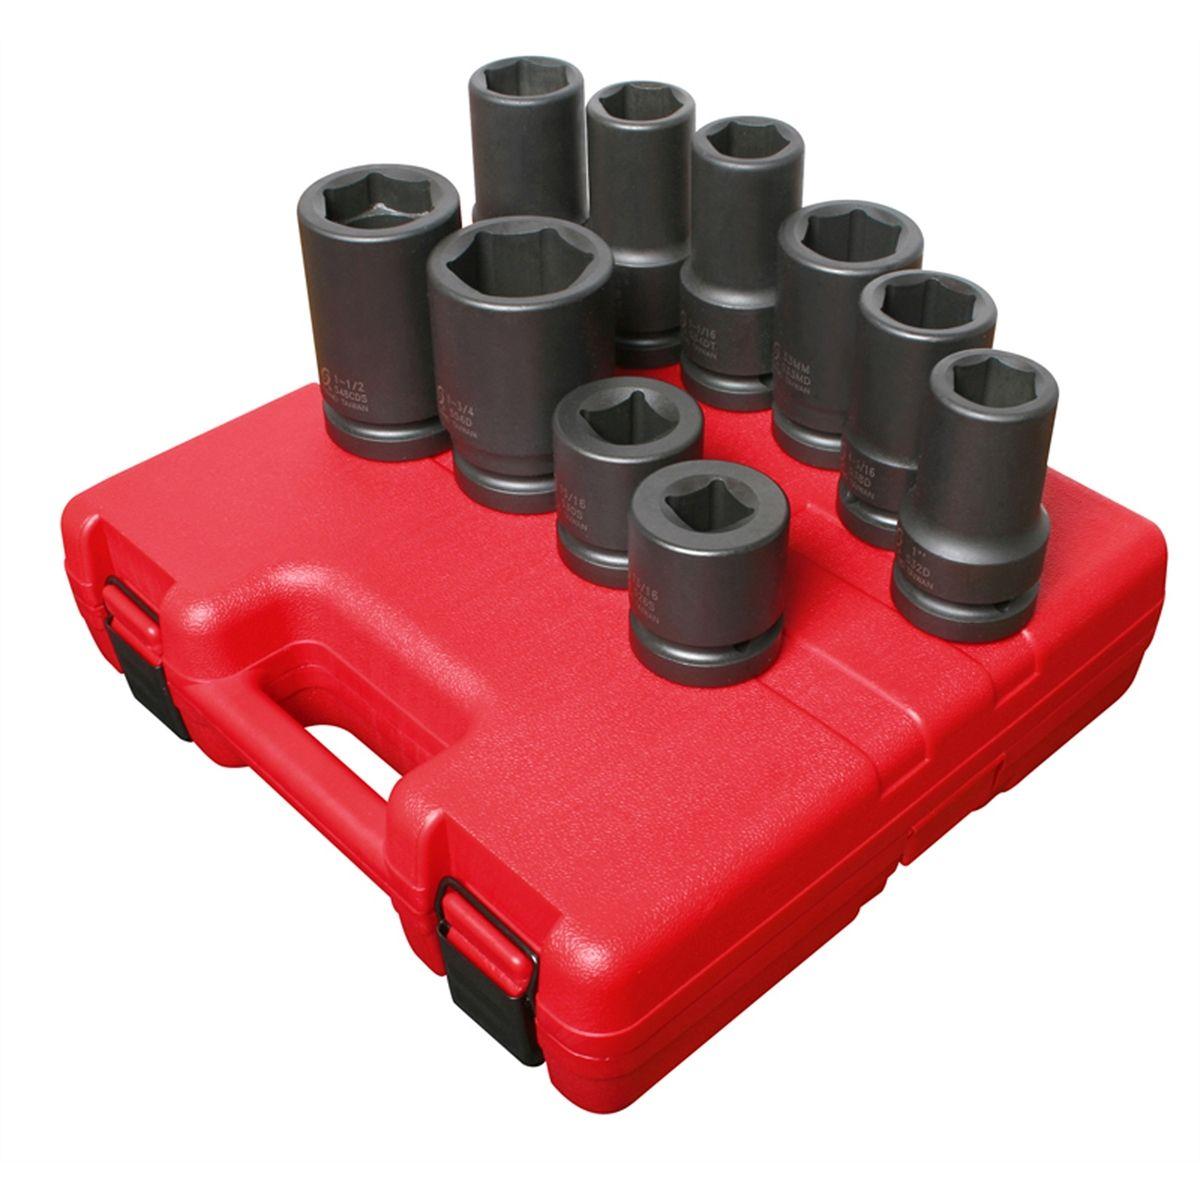 Sunex 4300 3//4-Inch Female 1-Inch Male Impact Socket Adapter